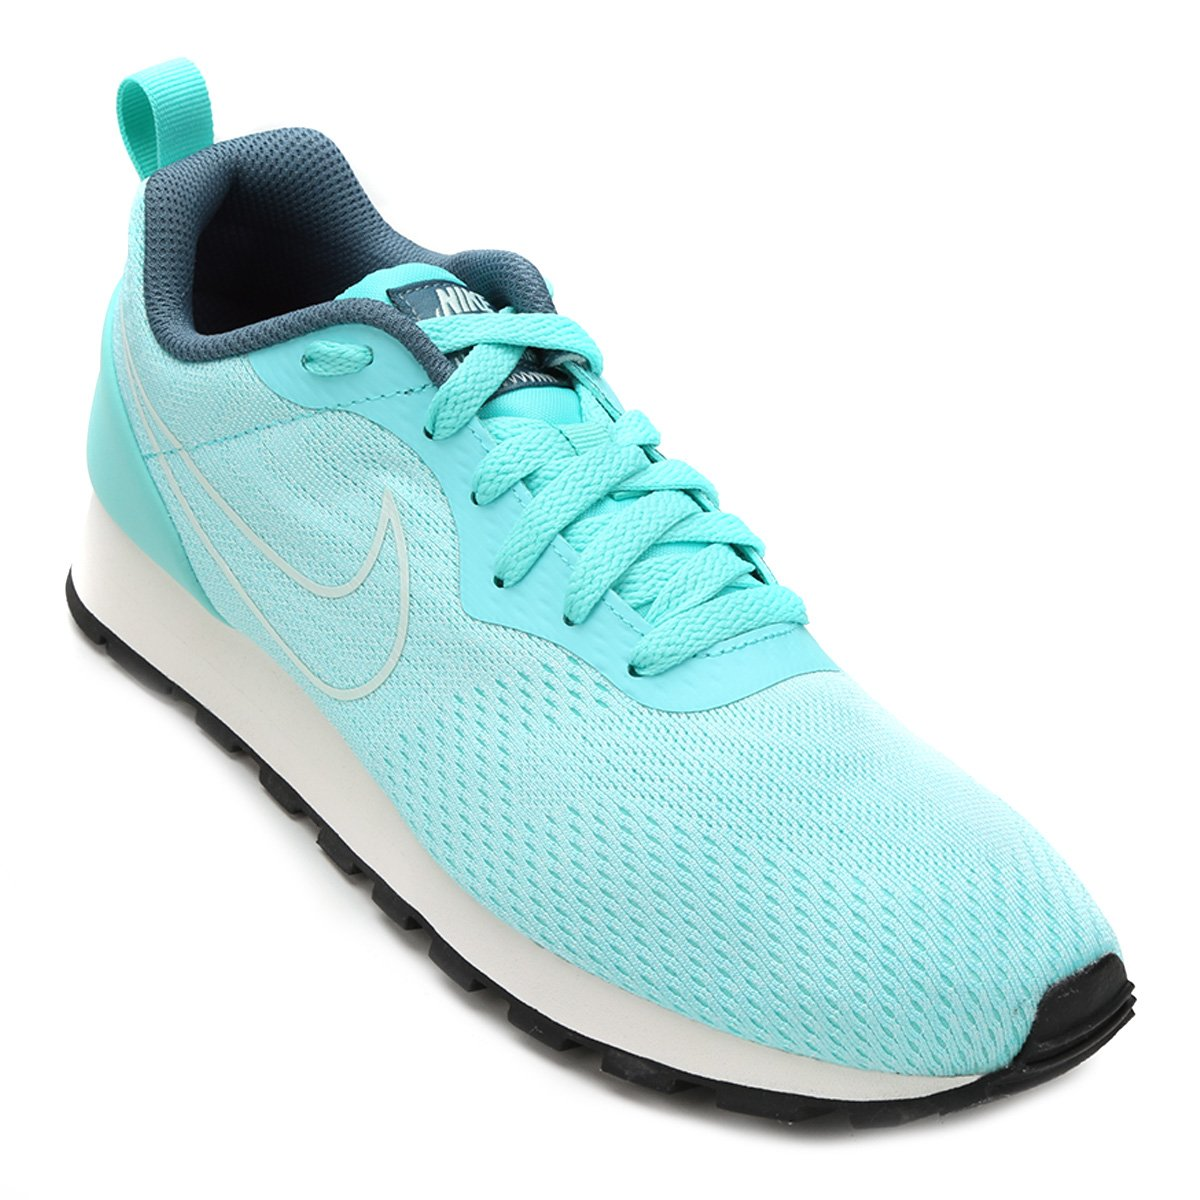 e1b491c282a92 Tênis Nike Md Runner 2 Eng Mesh Feminino - Verde água - Compre Agora ...